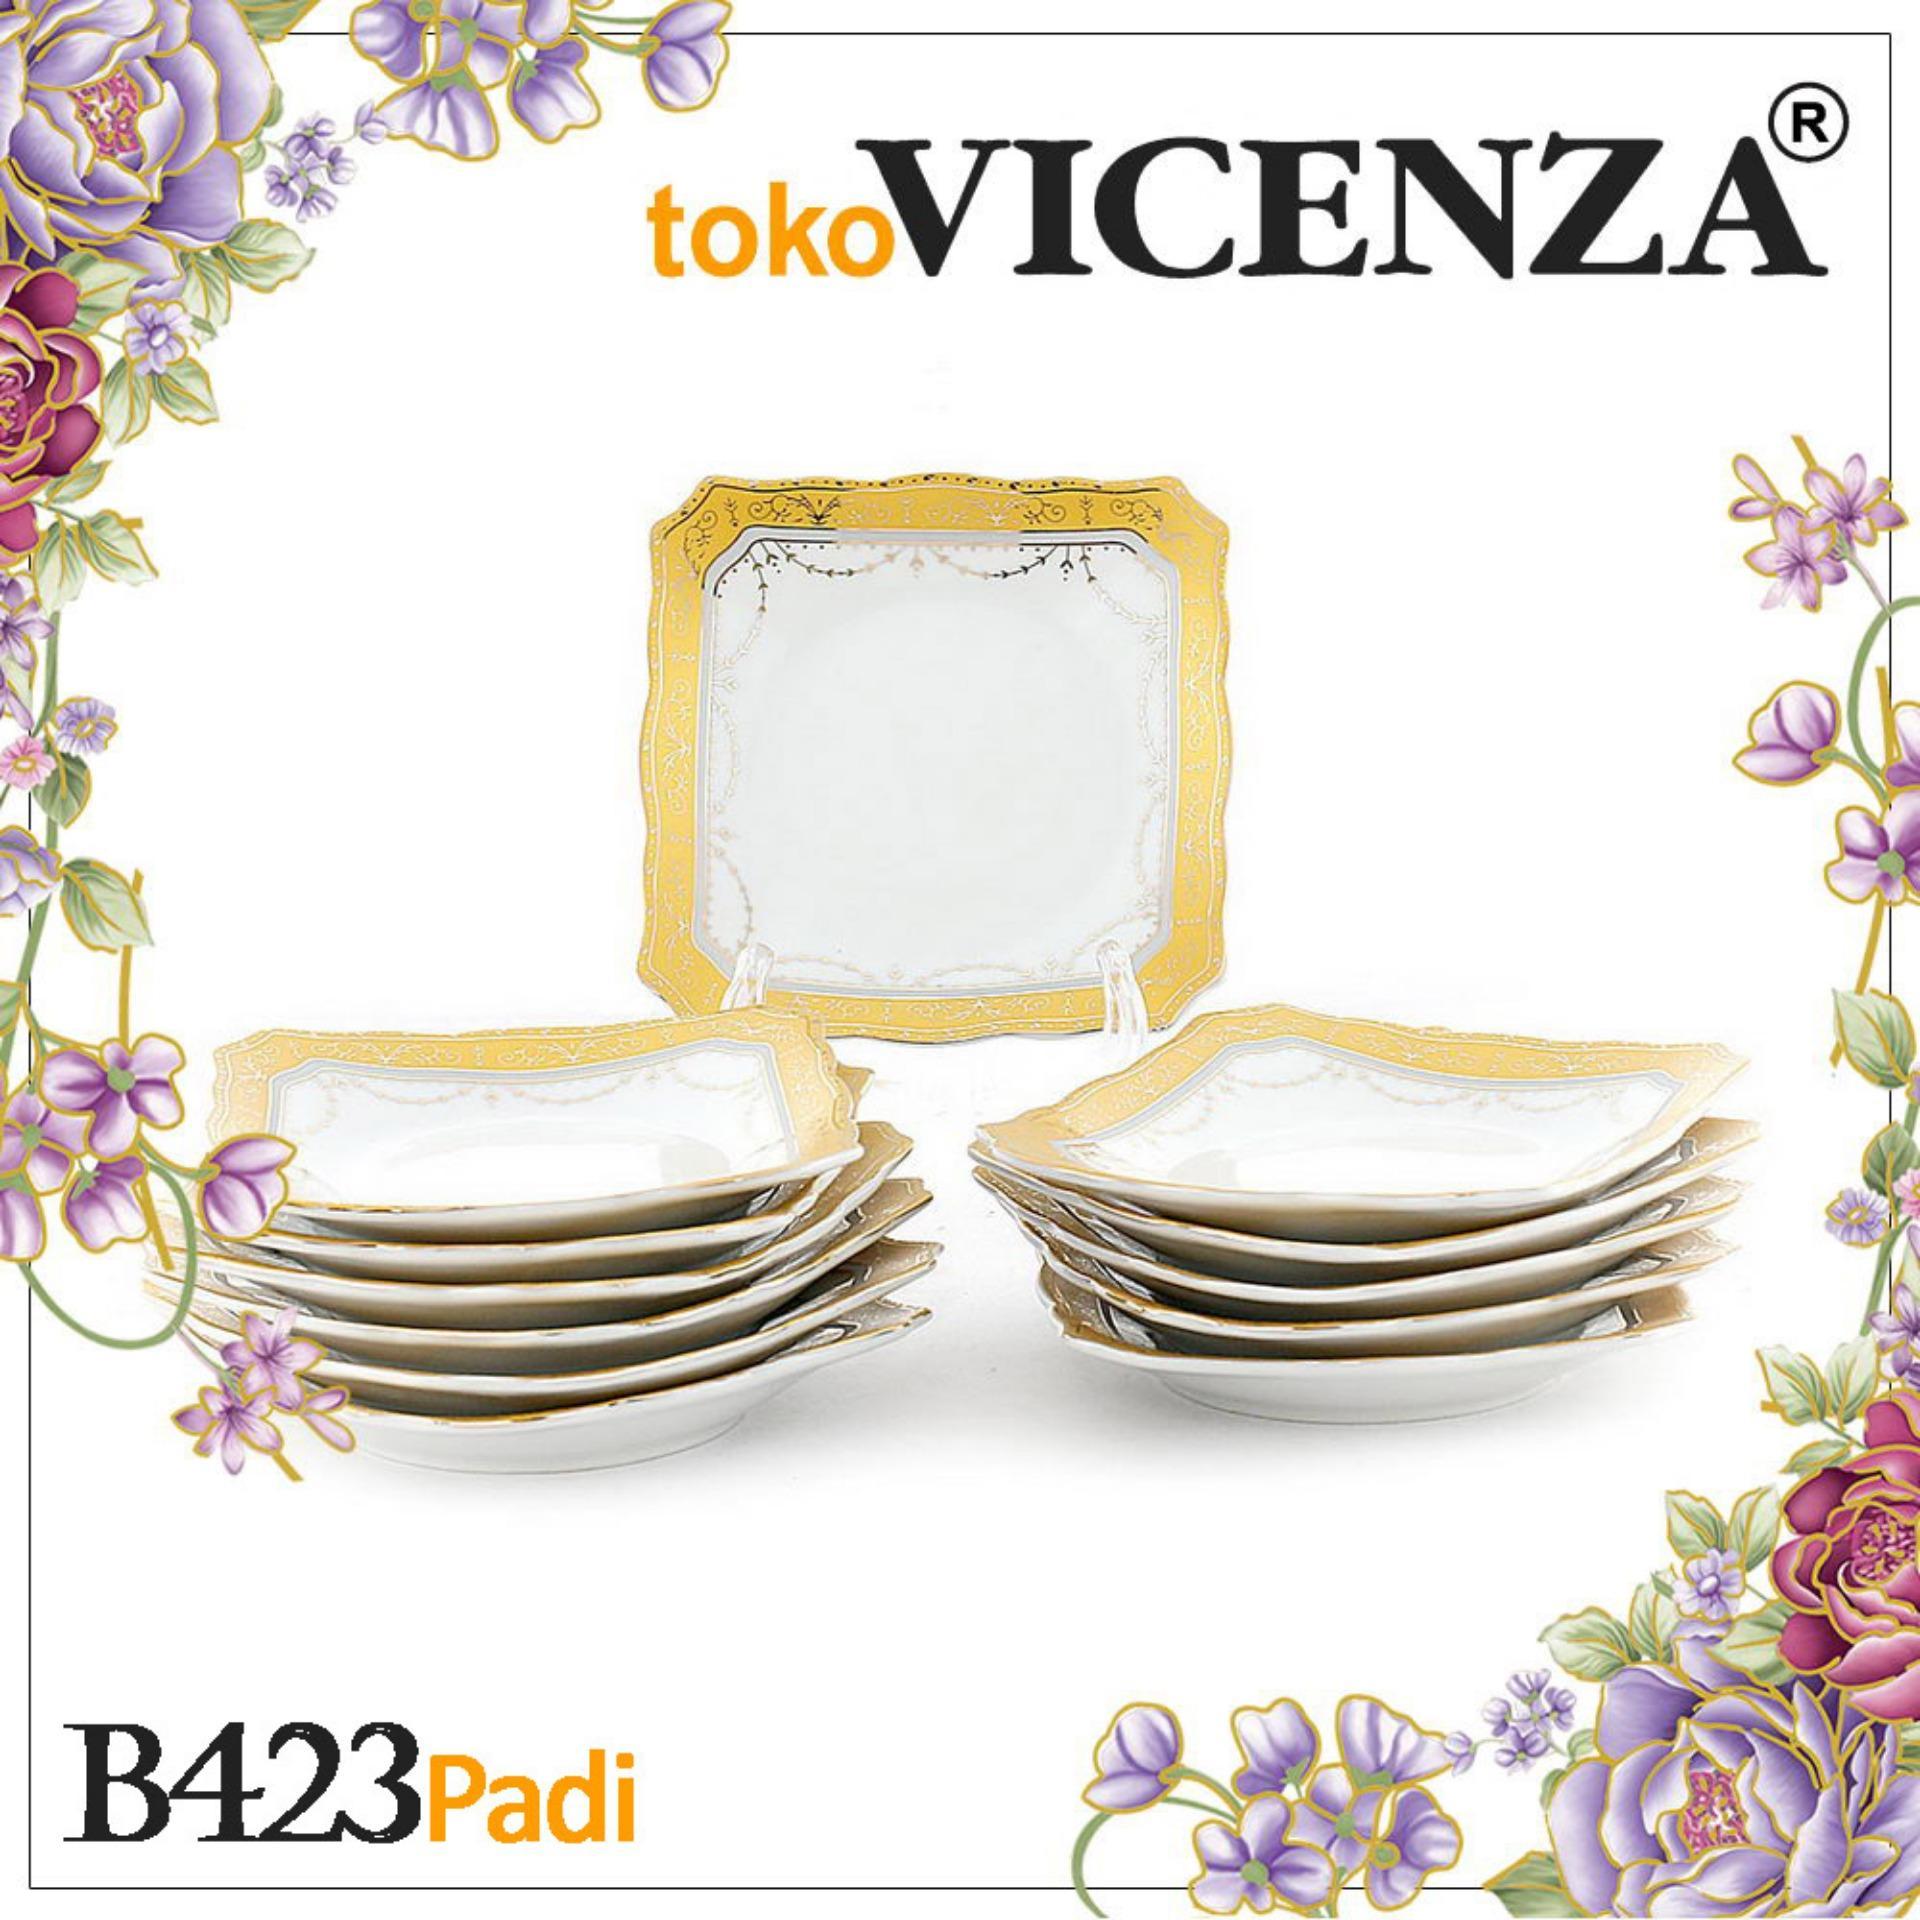 Jual Produk Vicenza Original Panci Set 12pcs V812 Small Square Plate B423 1 Lusin Motif Padi